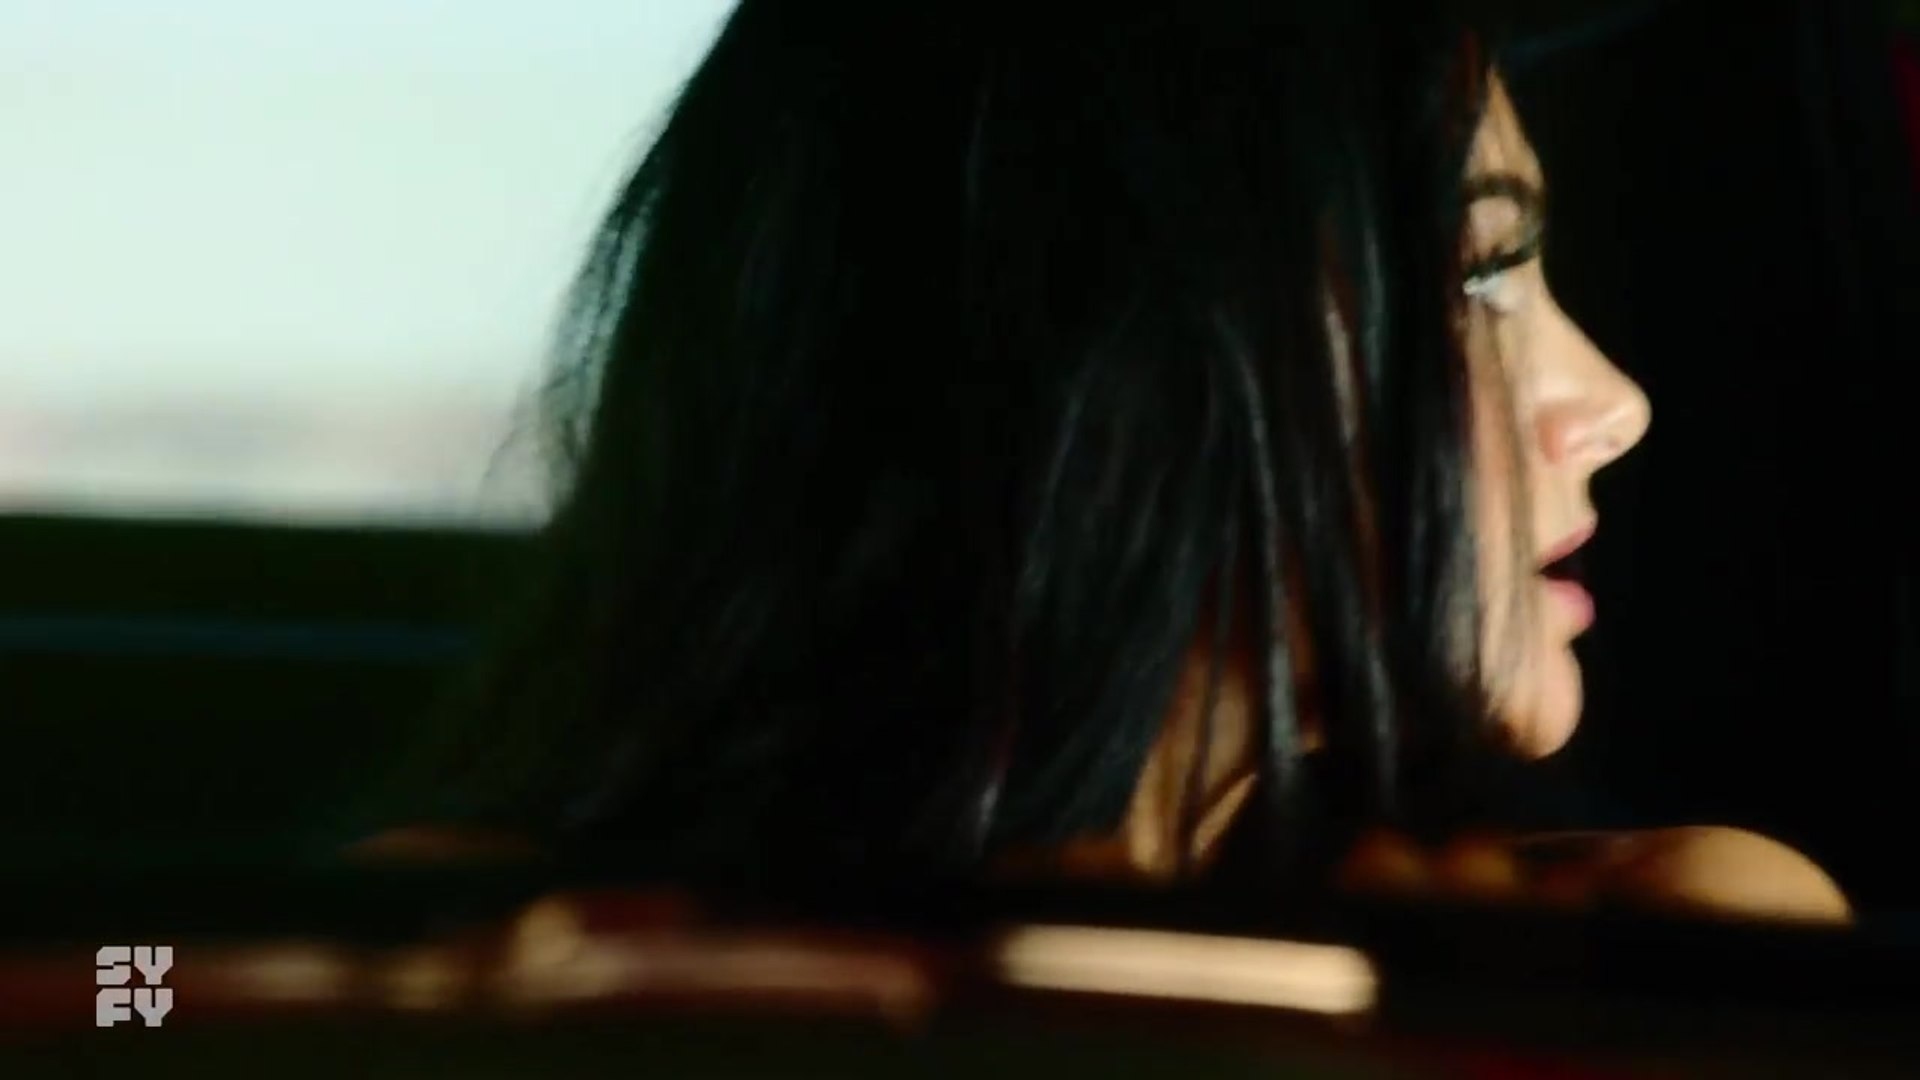 Blood Drive : Season 1 Episode 8 - A Fistful of Blood 'Full Streaming {Online HD}